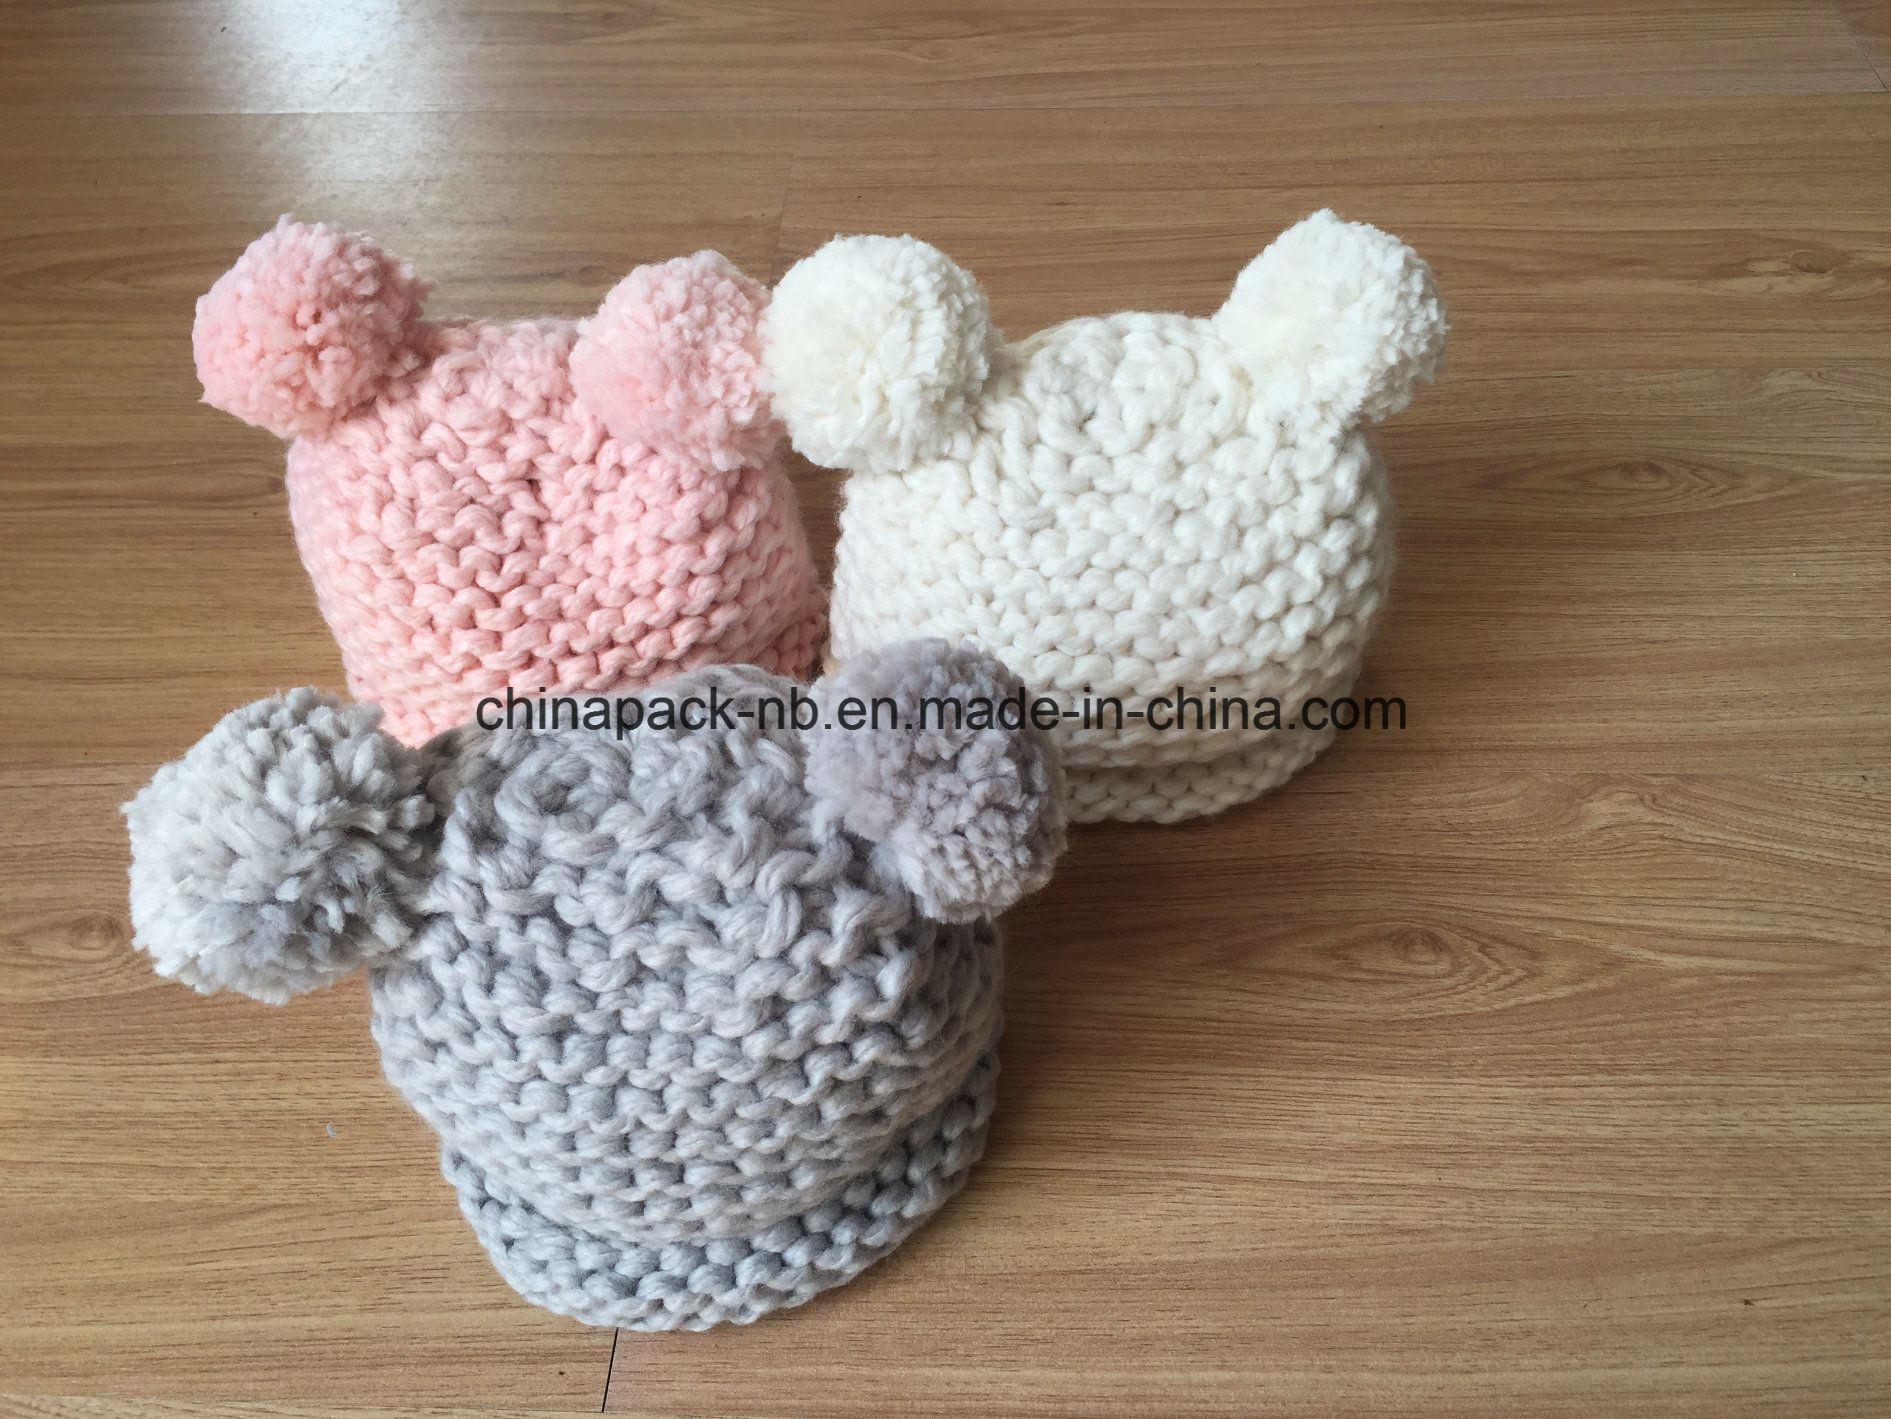 3025388c4 [Hot Item] Cat Ears Beanie Hat Cute Baby Kids Toddler Ski Skate Crochet  Knitted Warm Cap (CPHC-7006X)